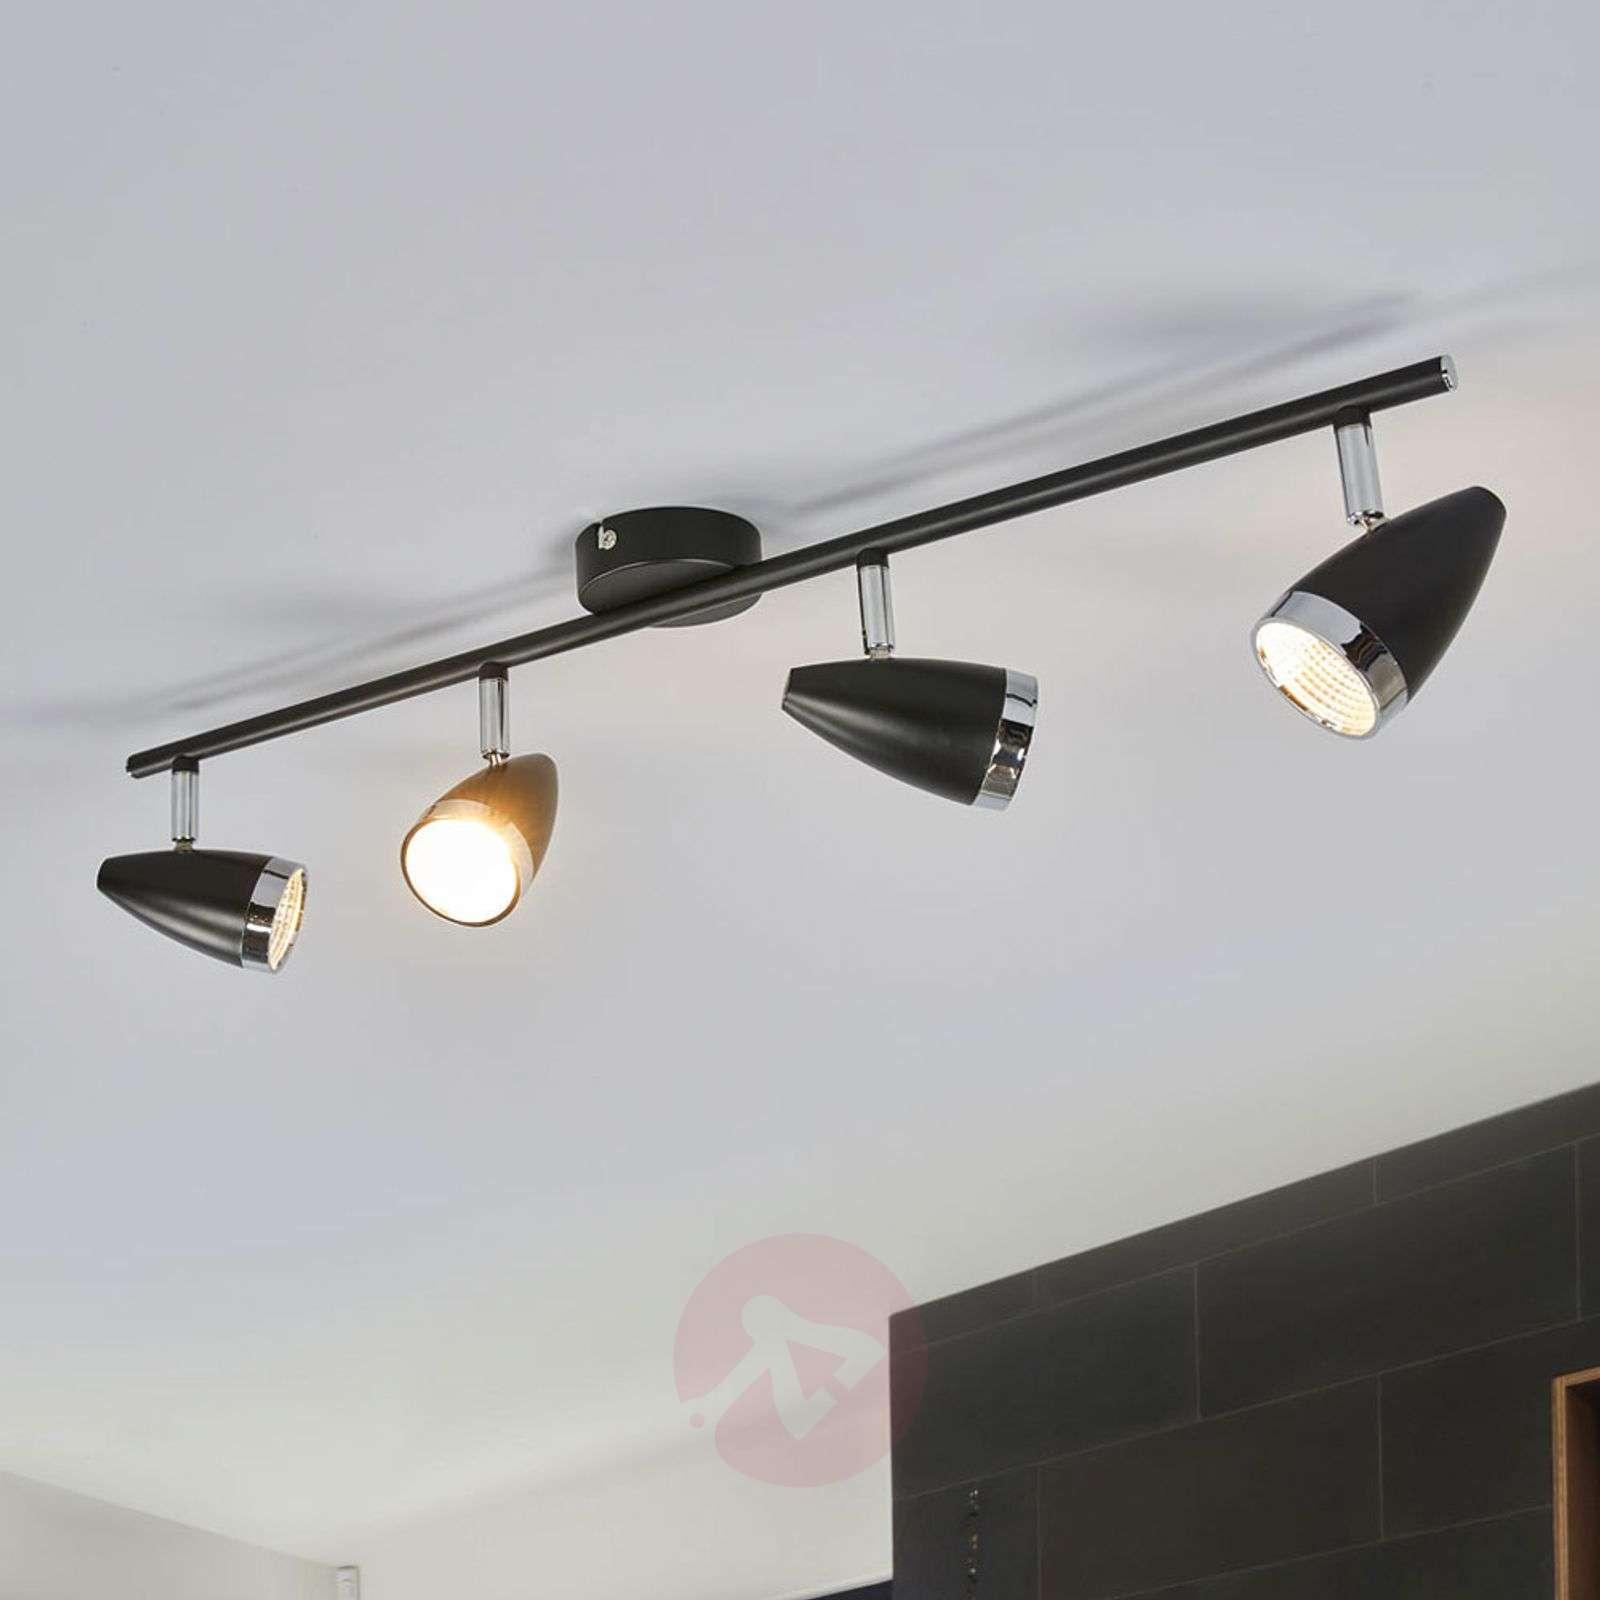 Four bulb led ceiling light ron adjustable